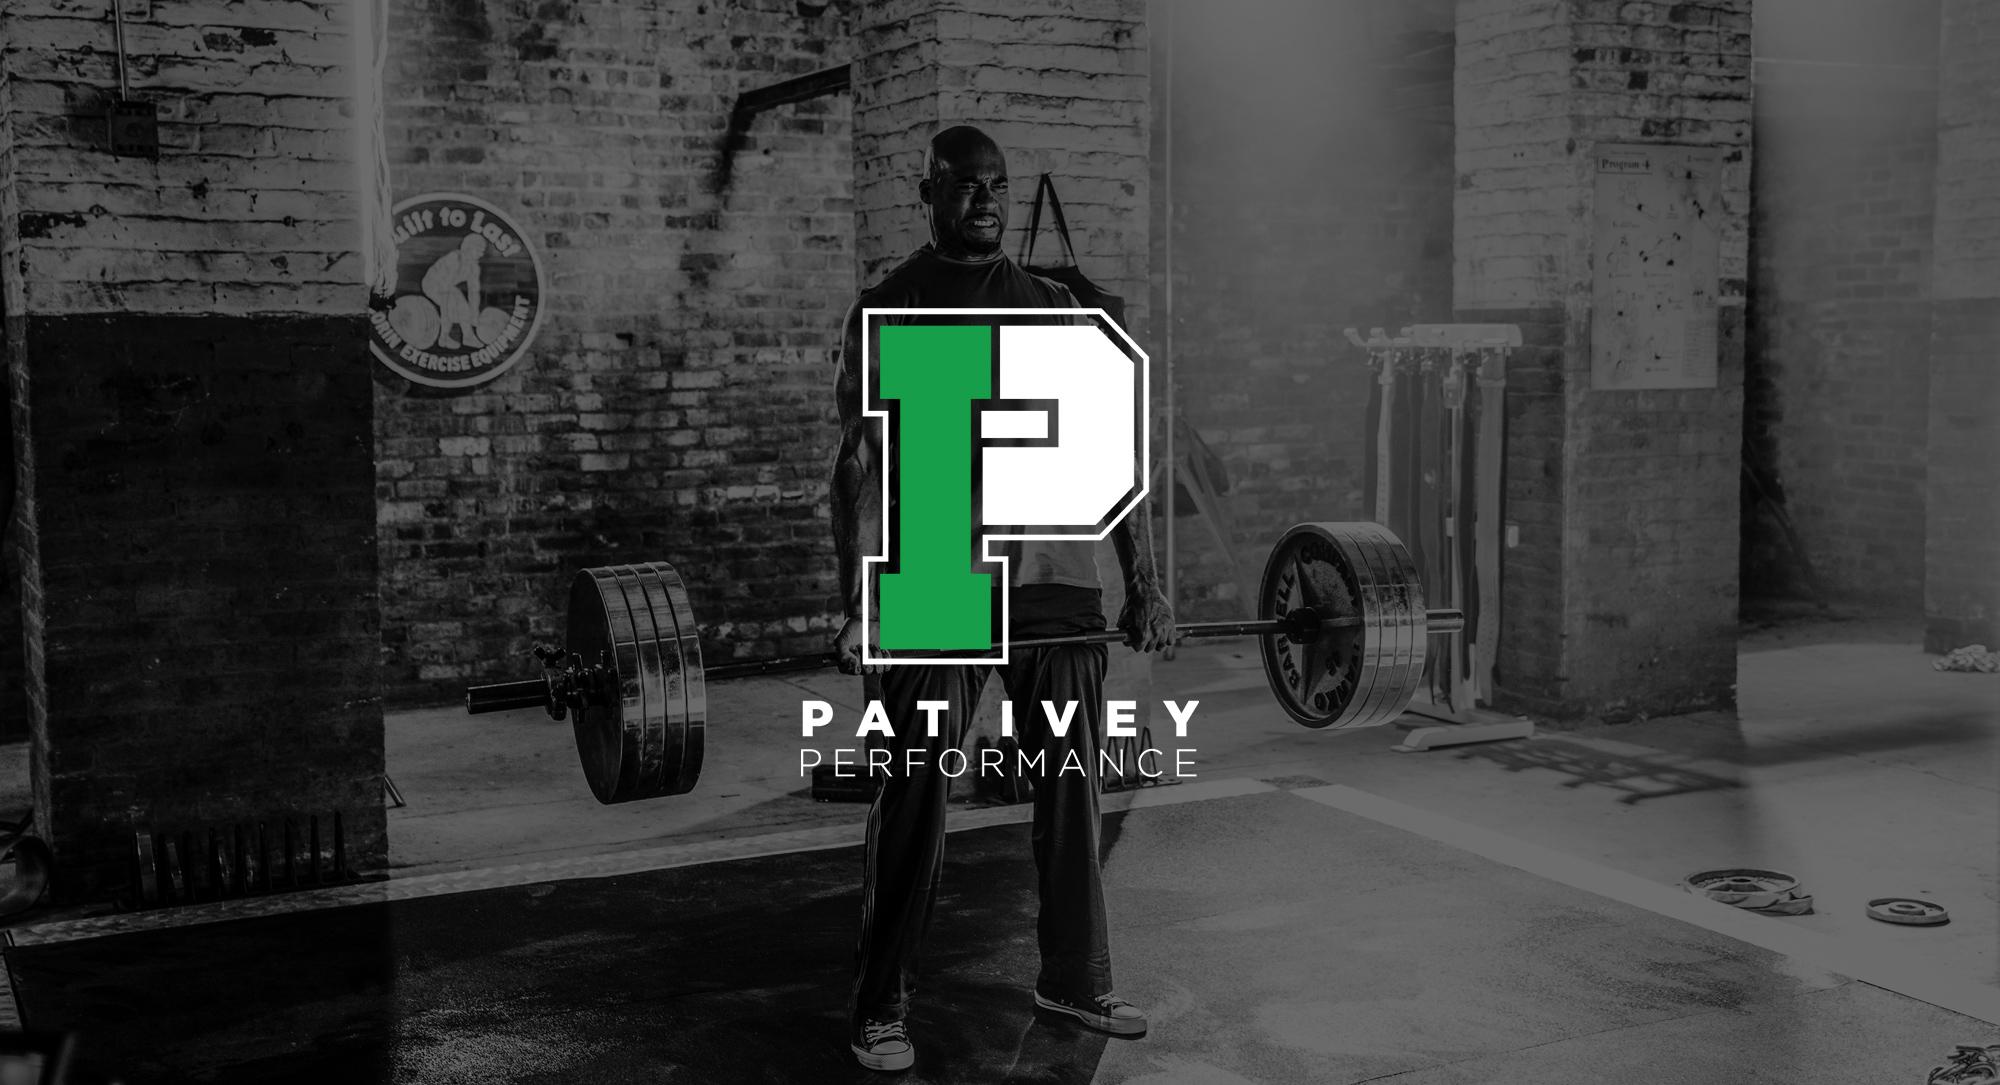 Pat Ivey